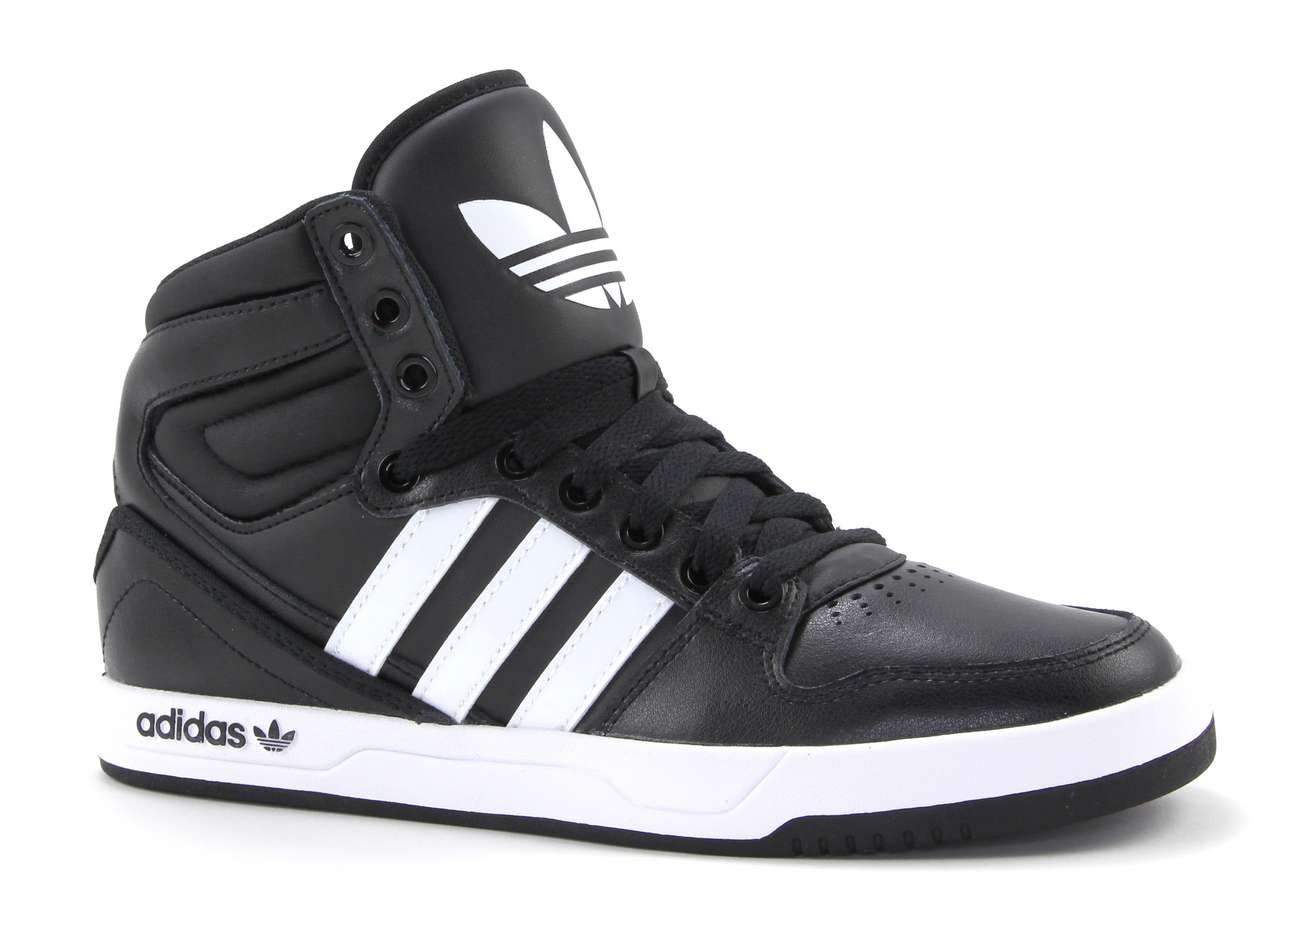 adidas hoge sneakers dames zwart